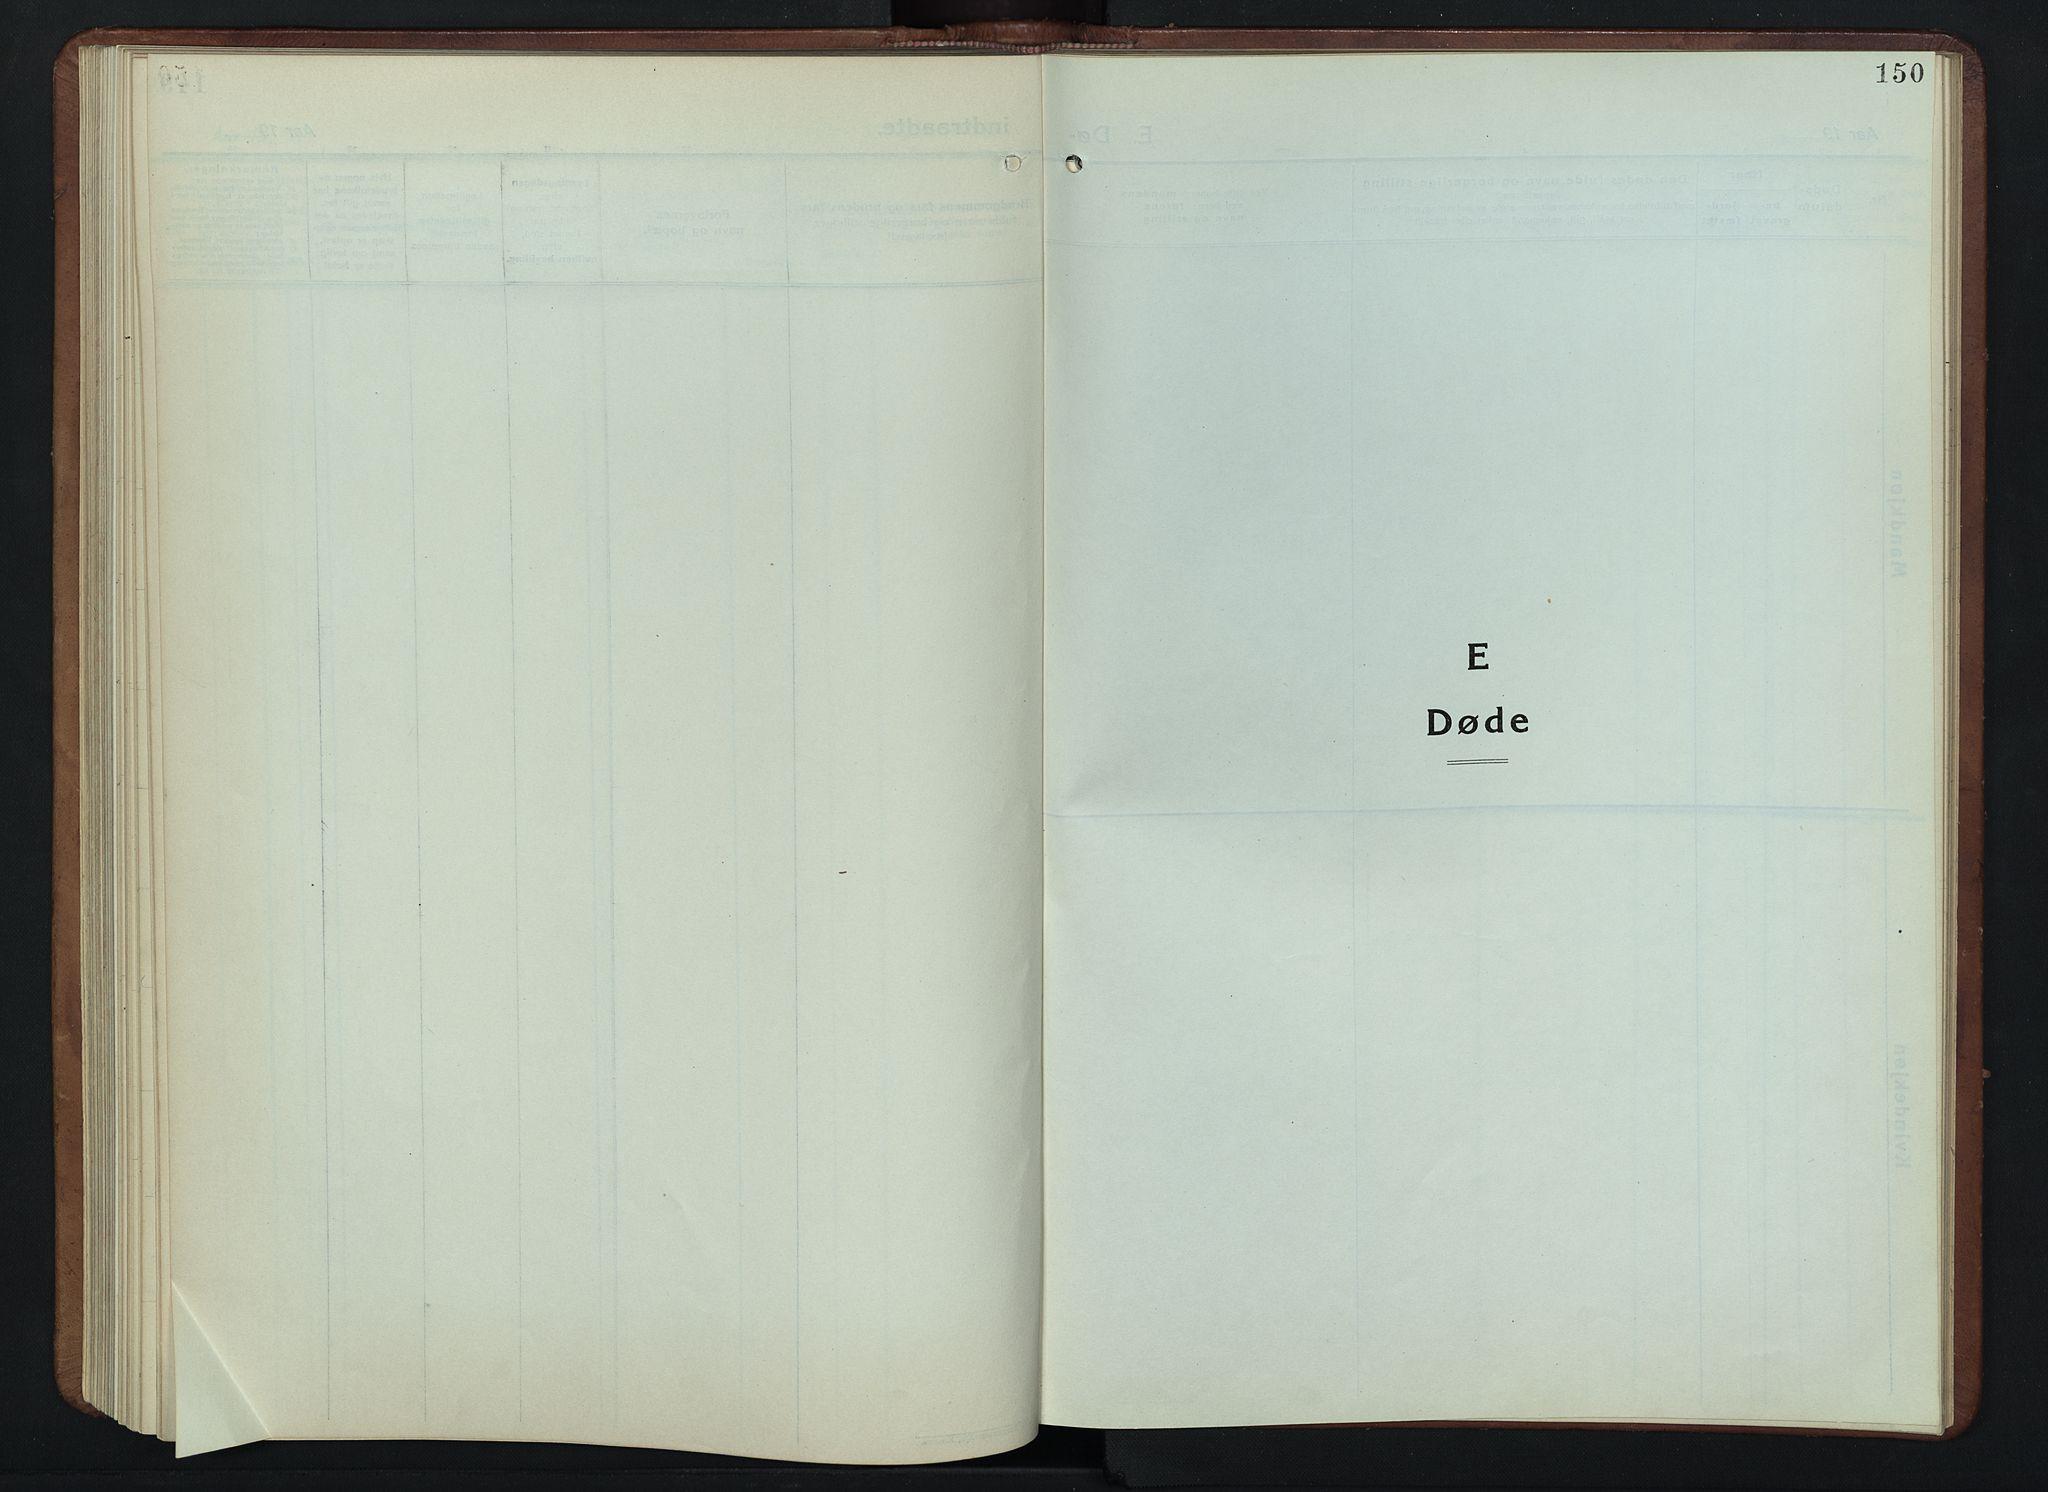 SAH, Lesja prestekontor, Klokkerbok nr. 9, 1924-1947, s. 150